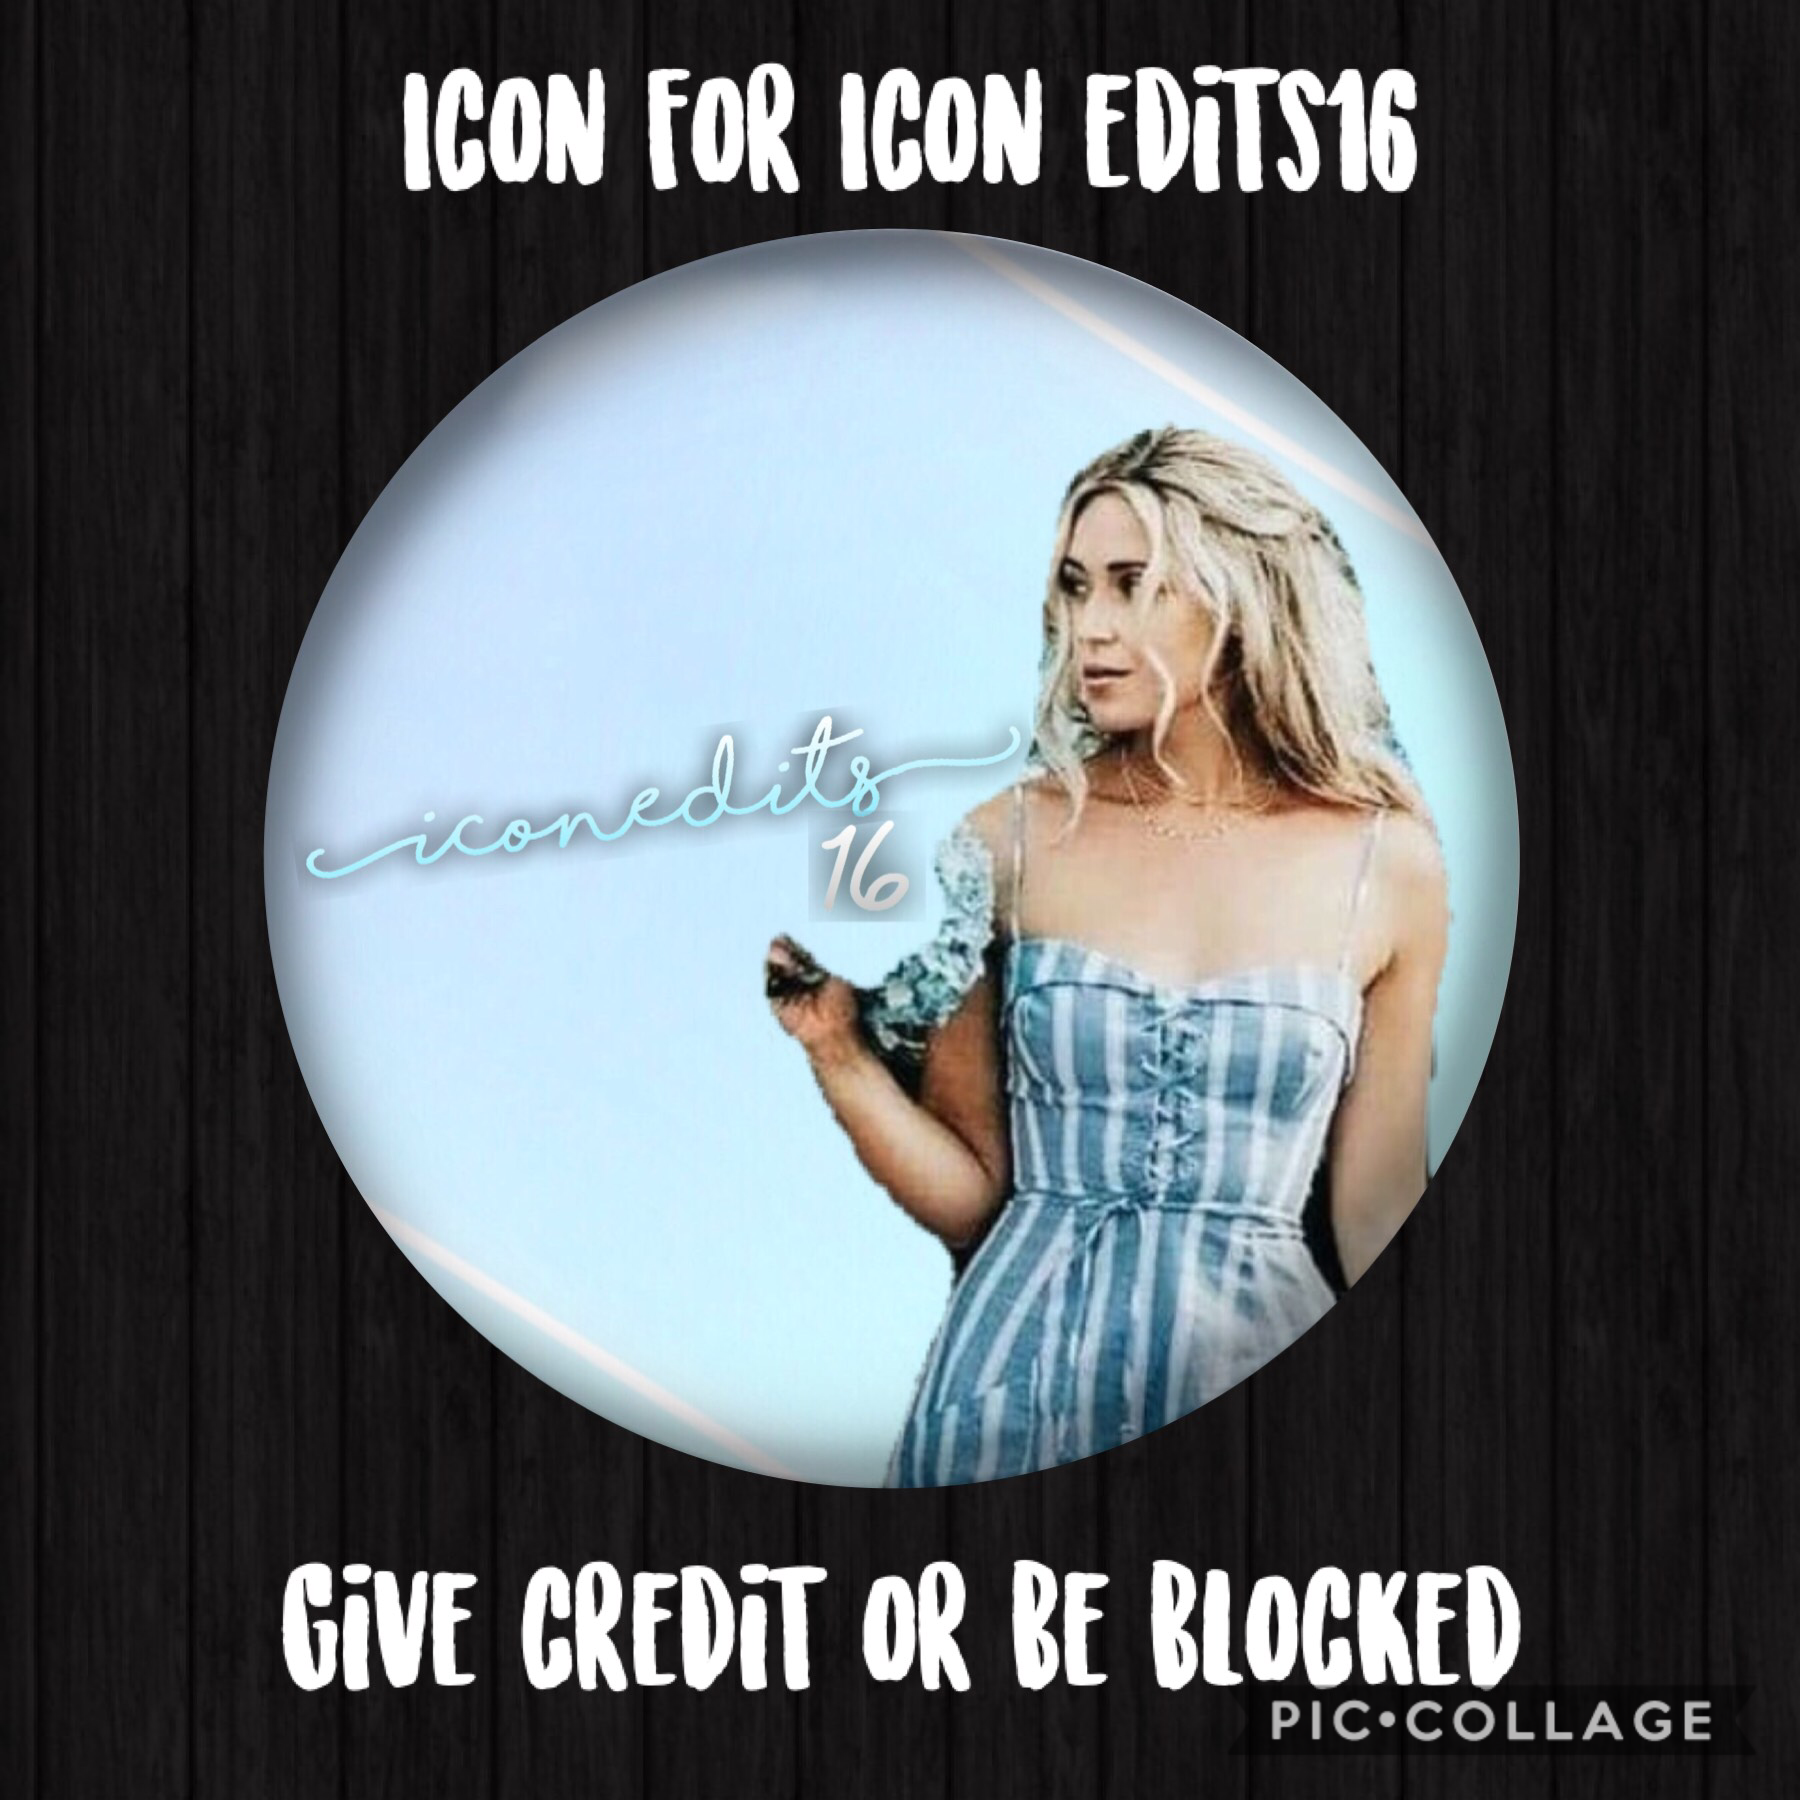 Icon for icon edits16